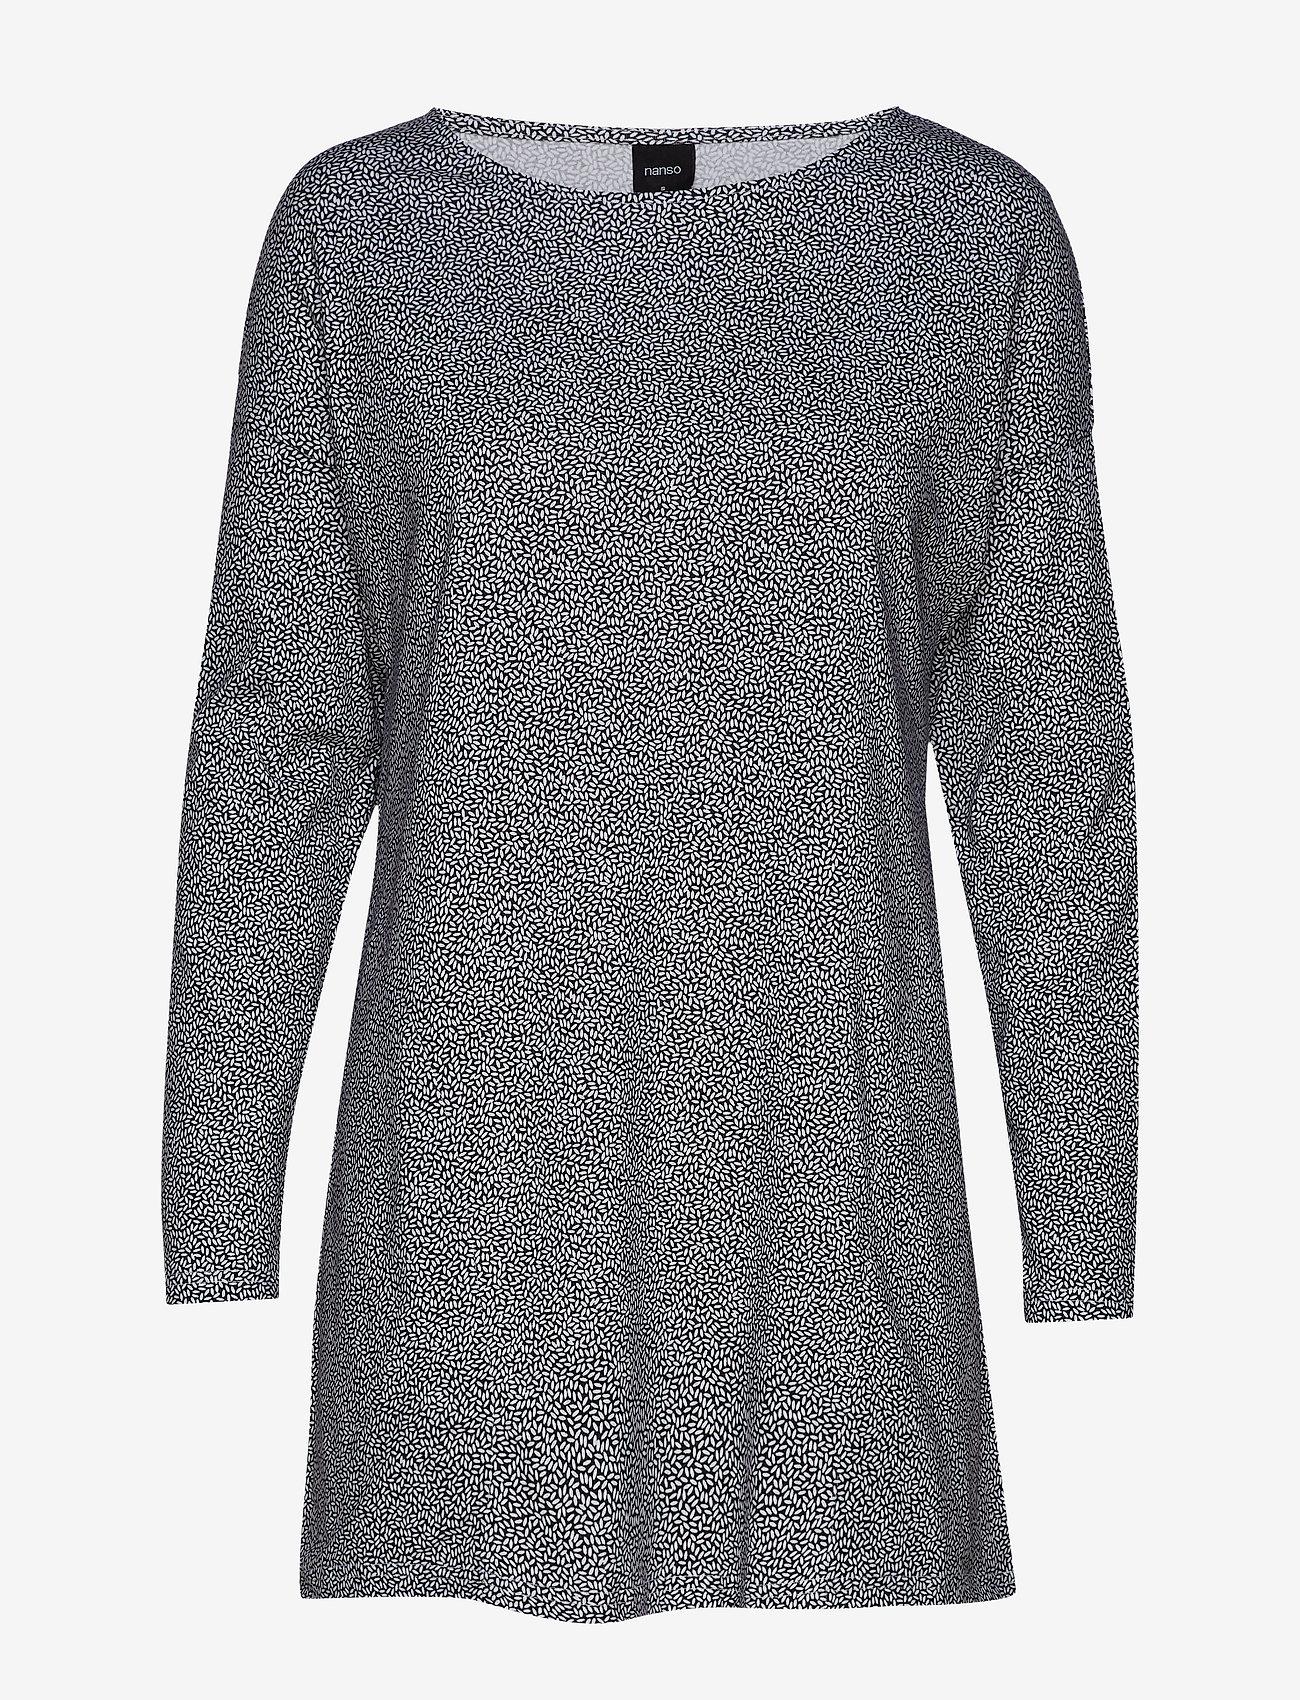 Nanso - Ladies tunic, Riisi - robes courtes - black - 0